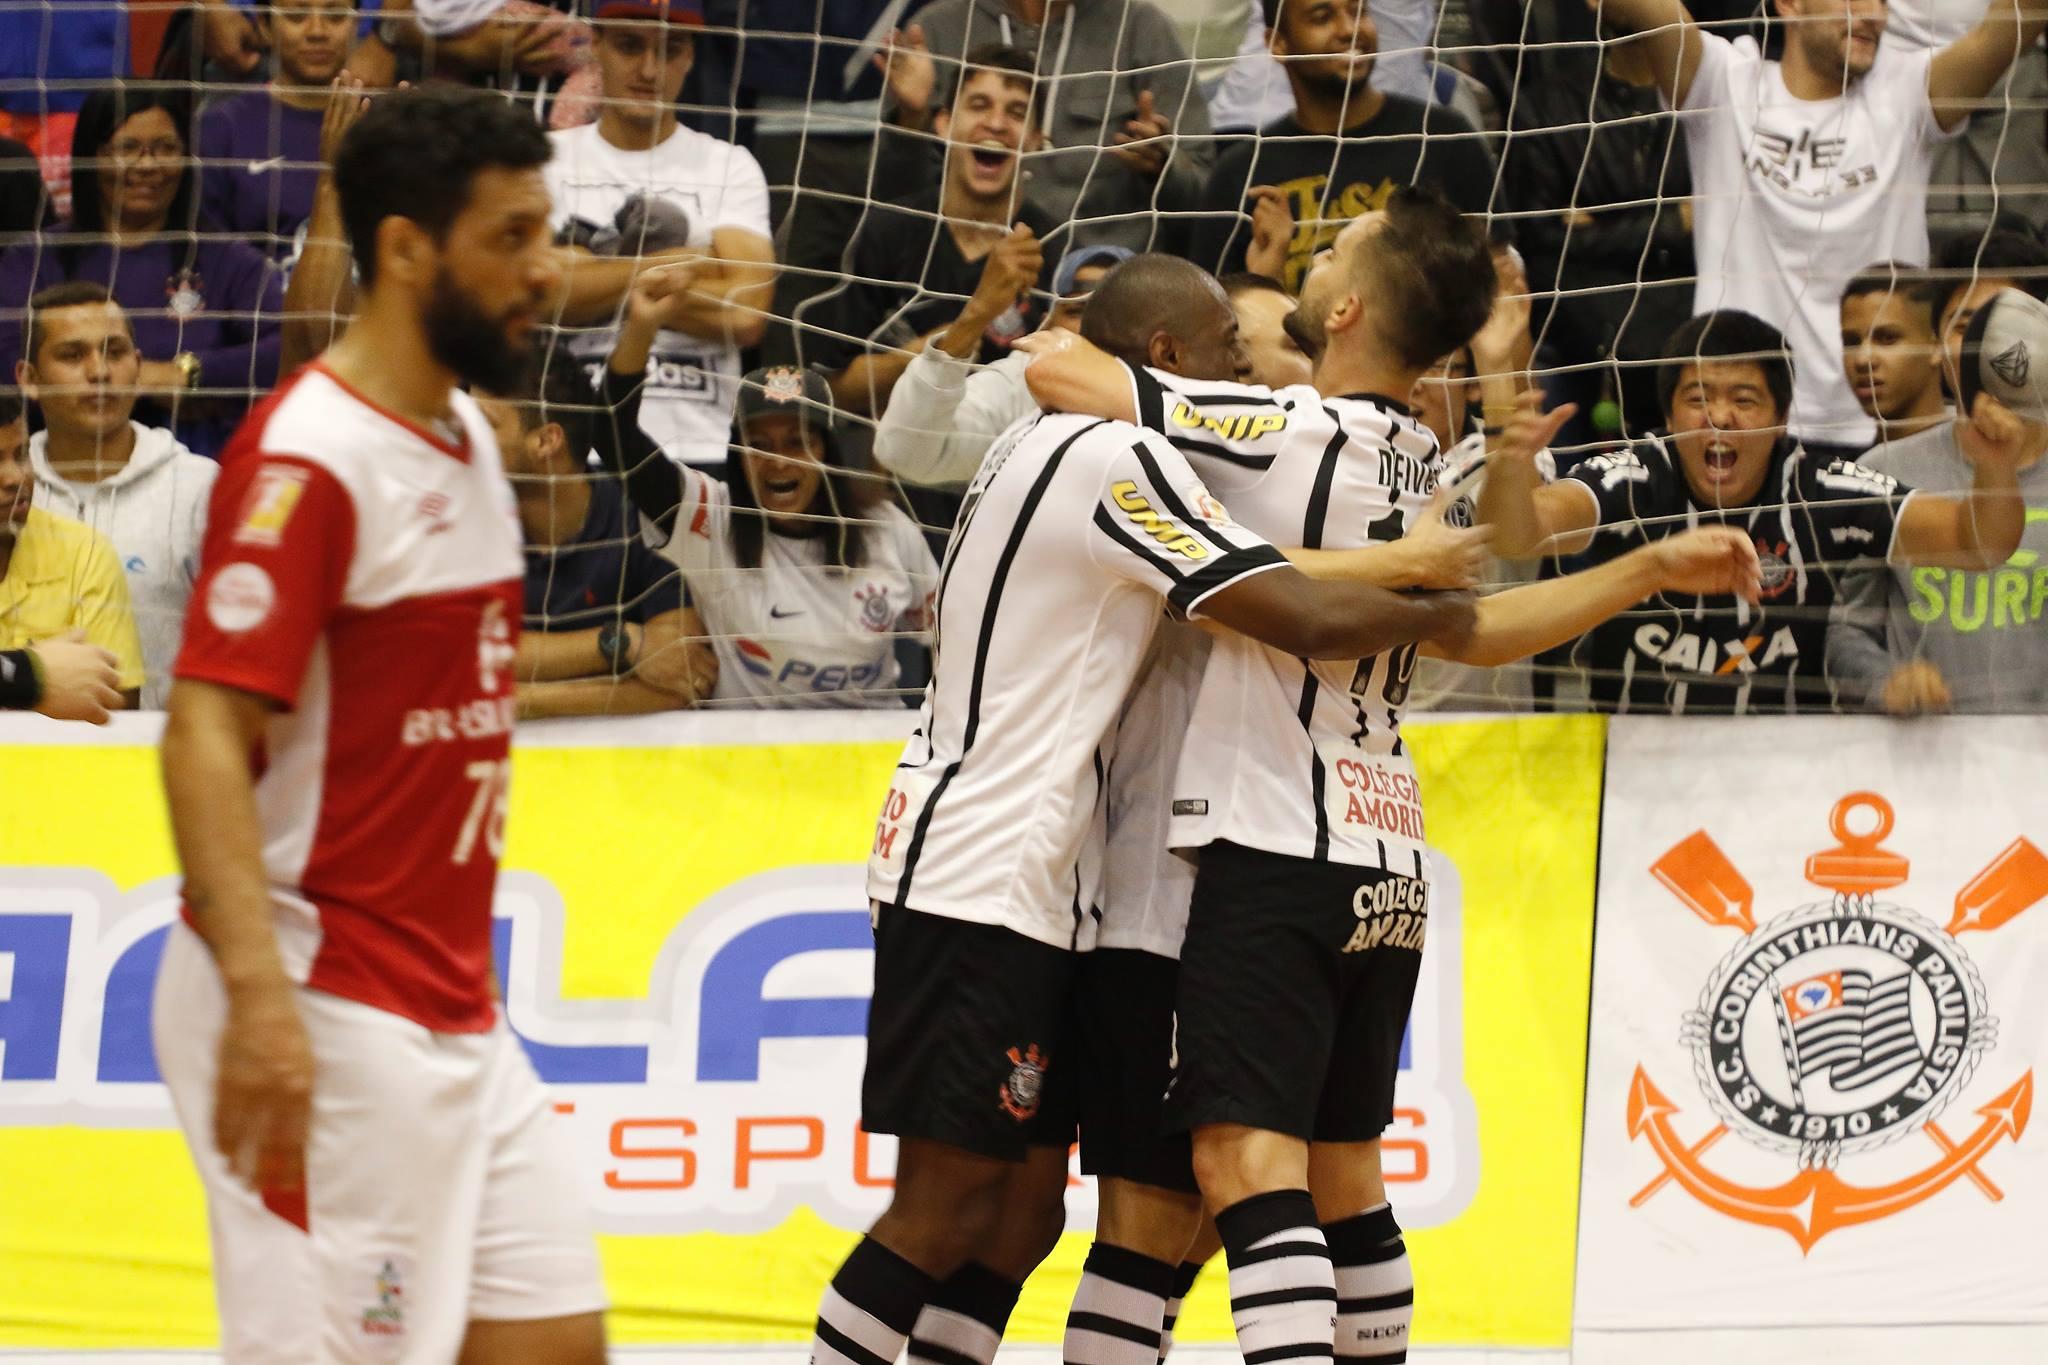 Corinthians vence Sorocaba 4a6d57d50daa2